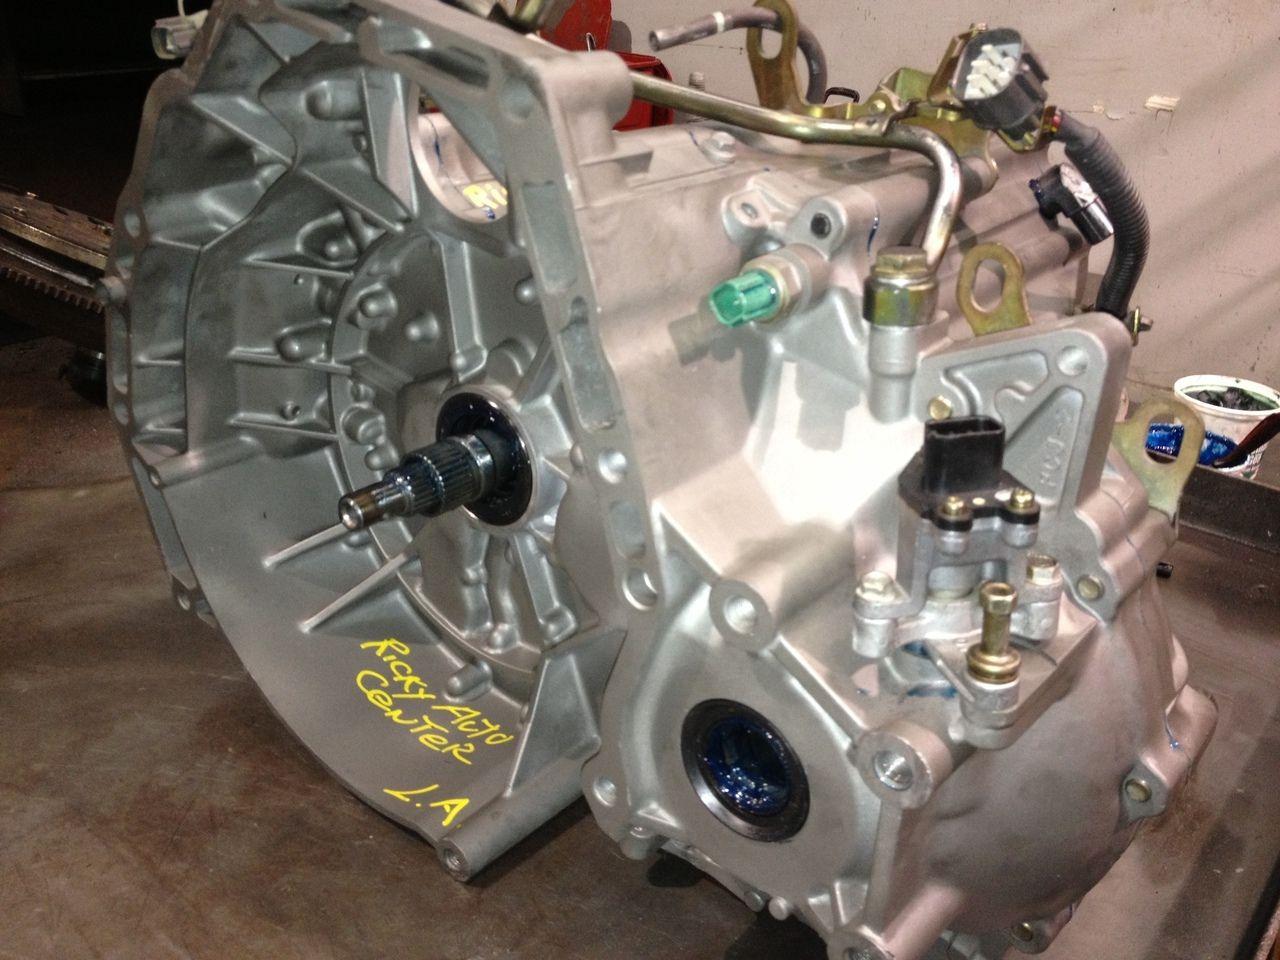 2003-2007 HONDA ACCORD REBUILT AUTO TRANSMISSION , 3.0L V6 - A +  TRANSMISSIONS